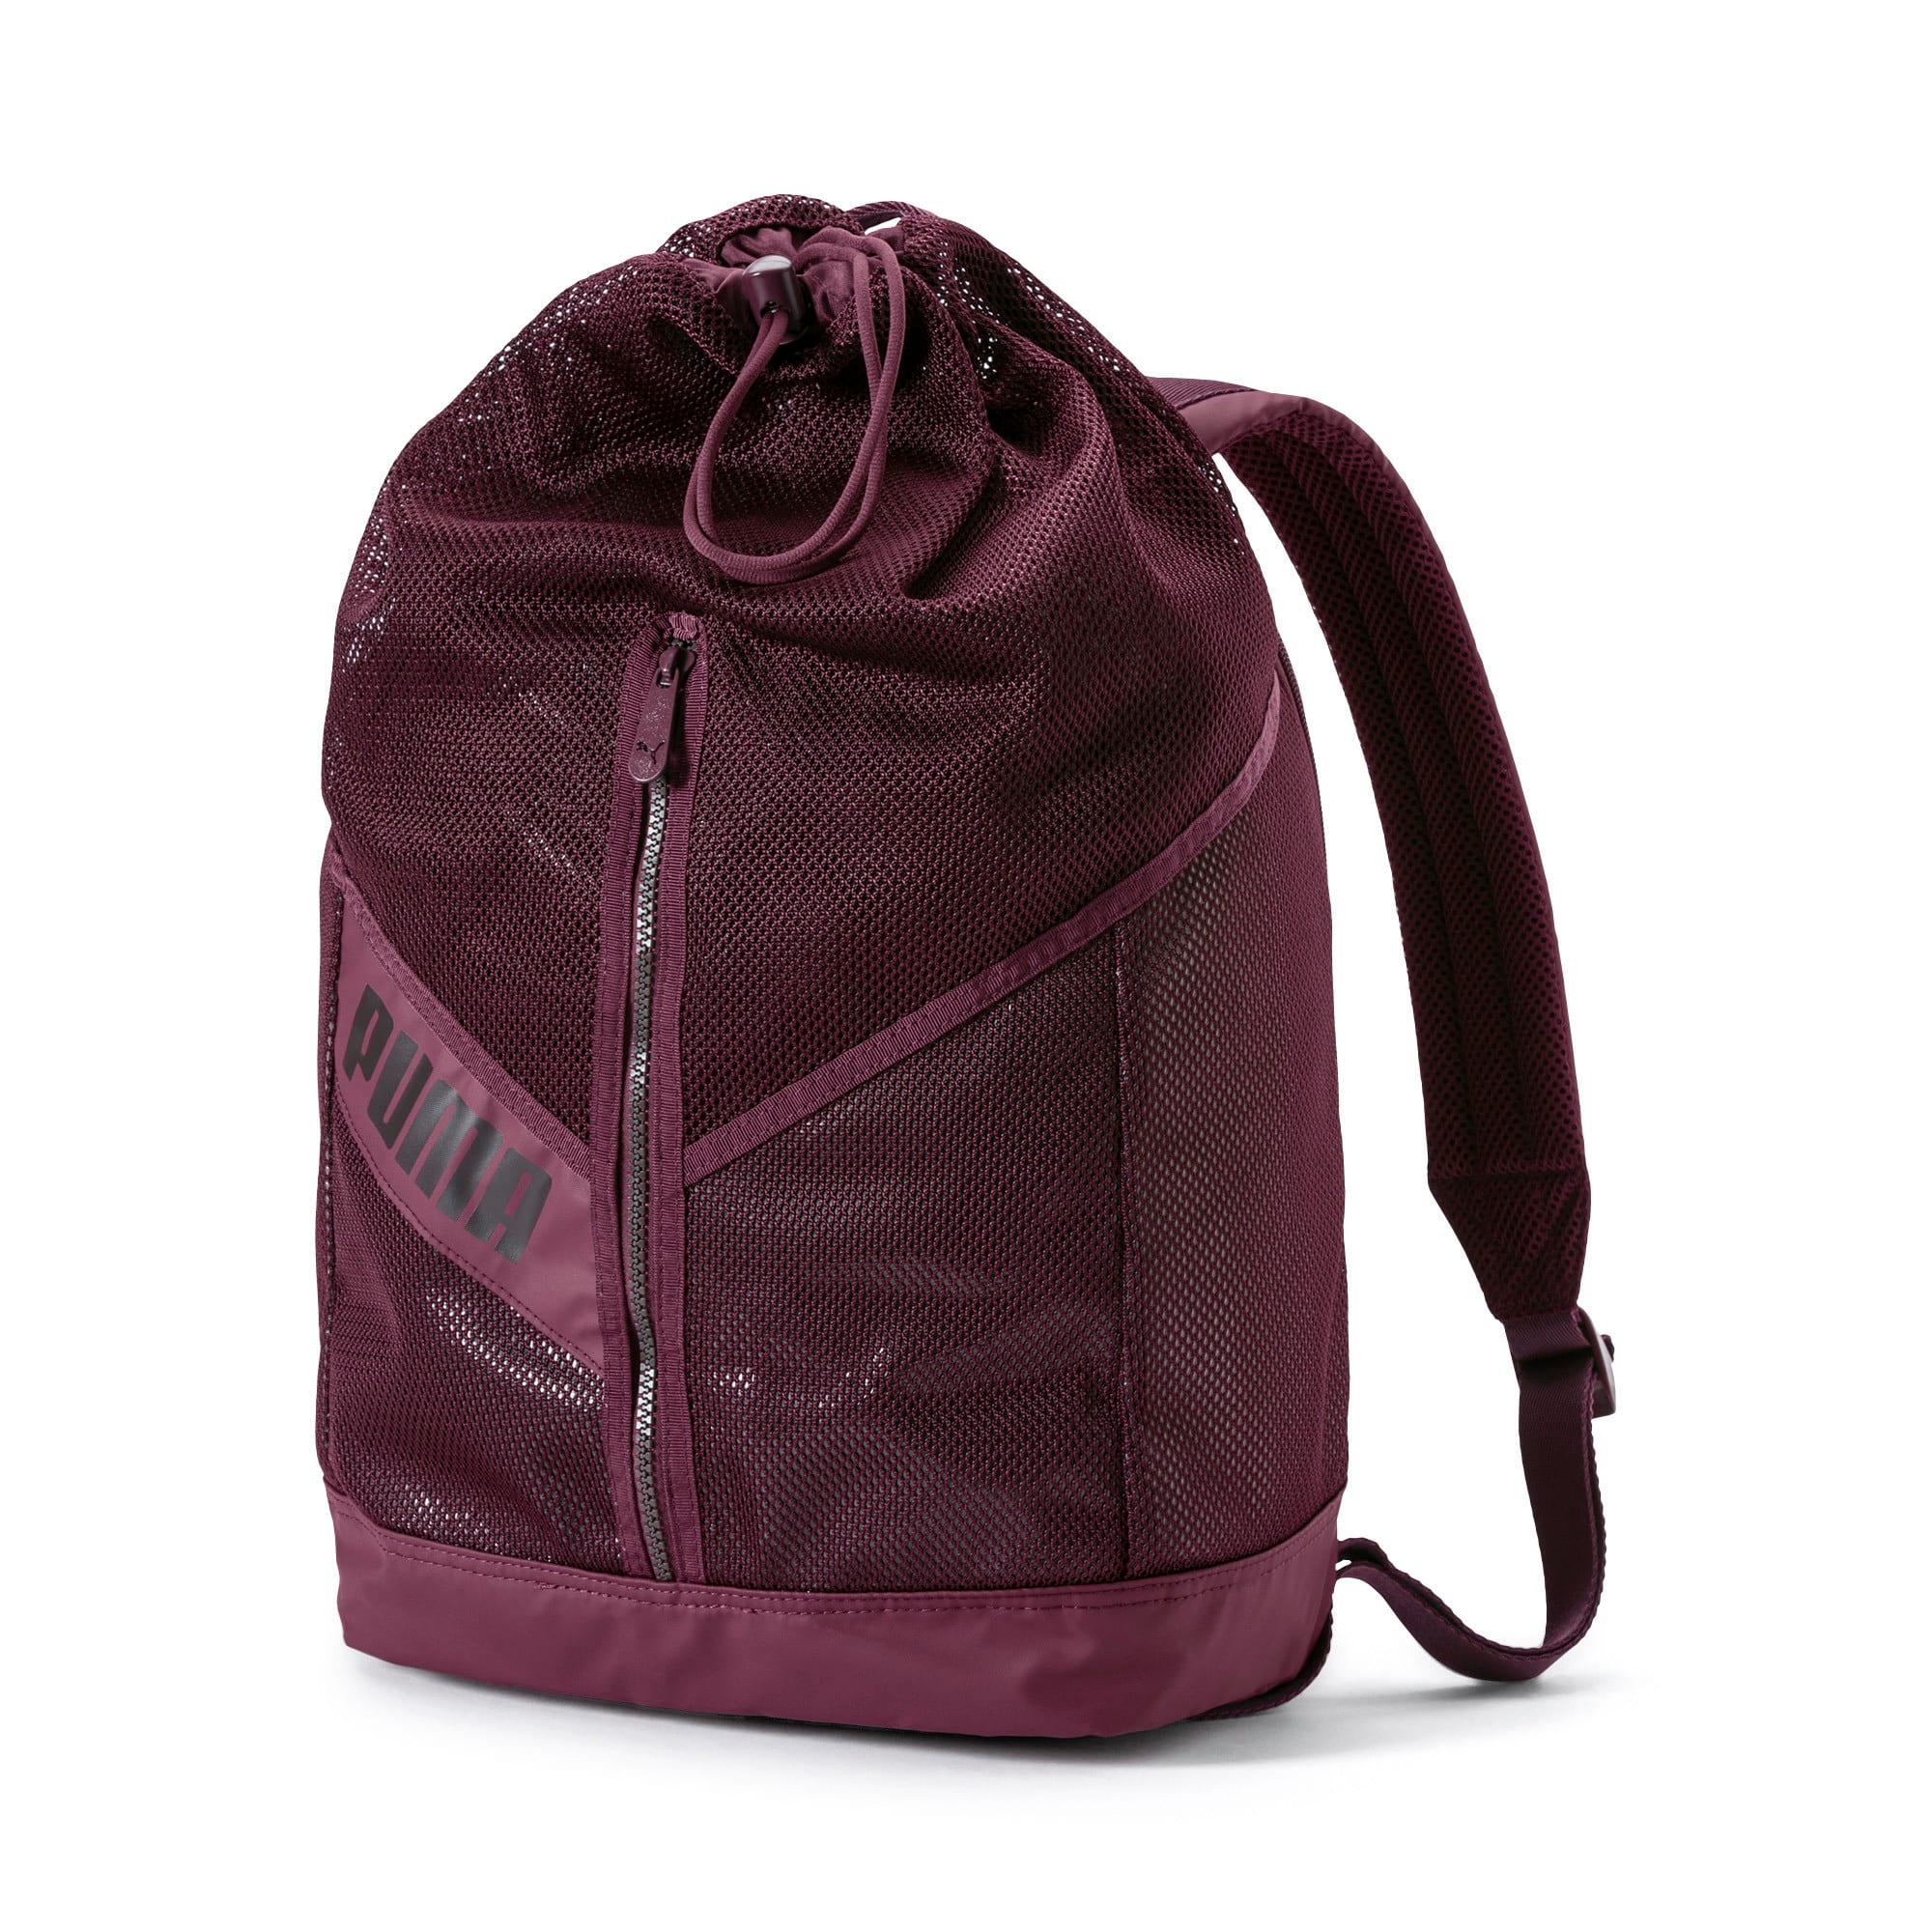 Thumbnail 1 of Ambition Women's Backpack, Fig-Bronze-metallic, medium